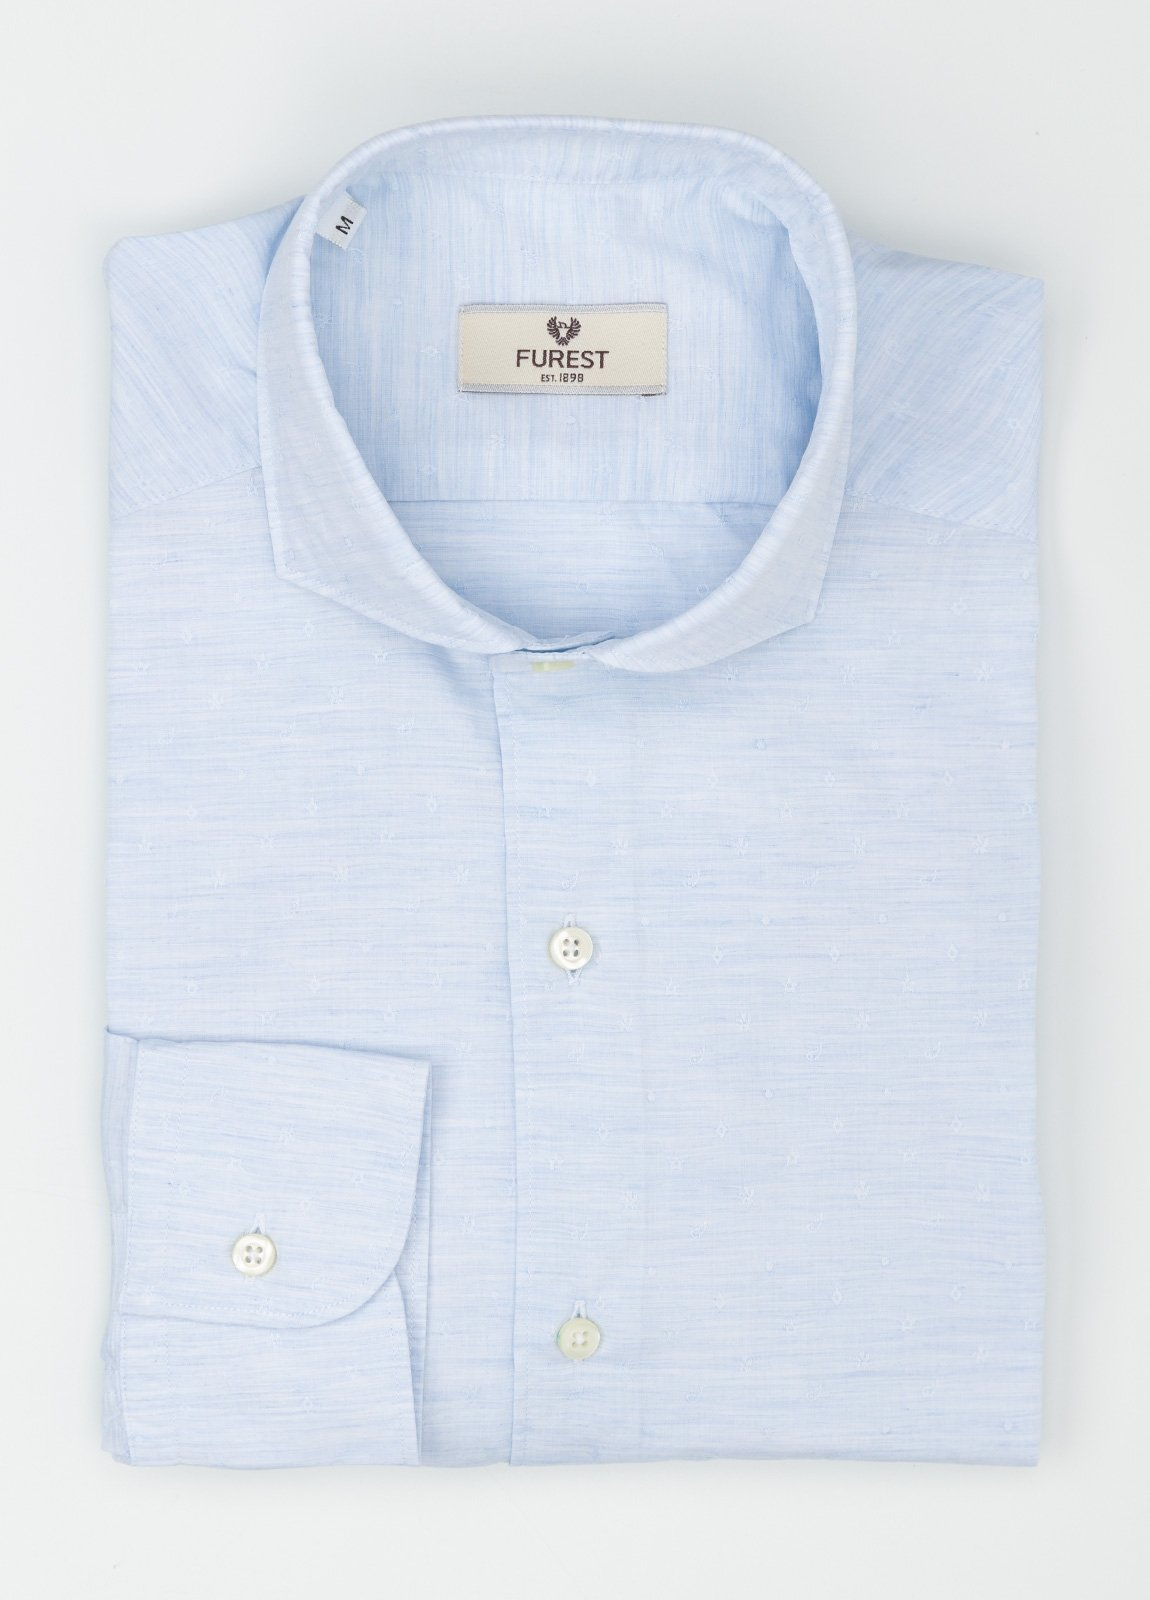 Camisa Leisure Wear SLIM FIT Modelo CAPRI tejido dibujo fantasía color celeste, 100% Algodón. - Ítem1